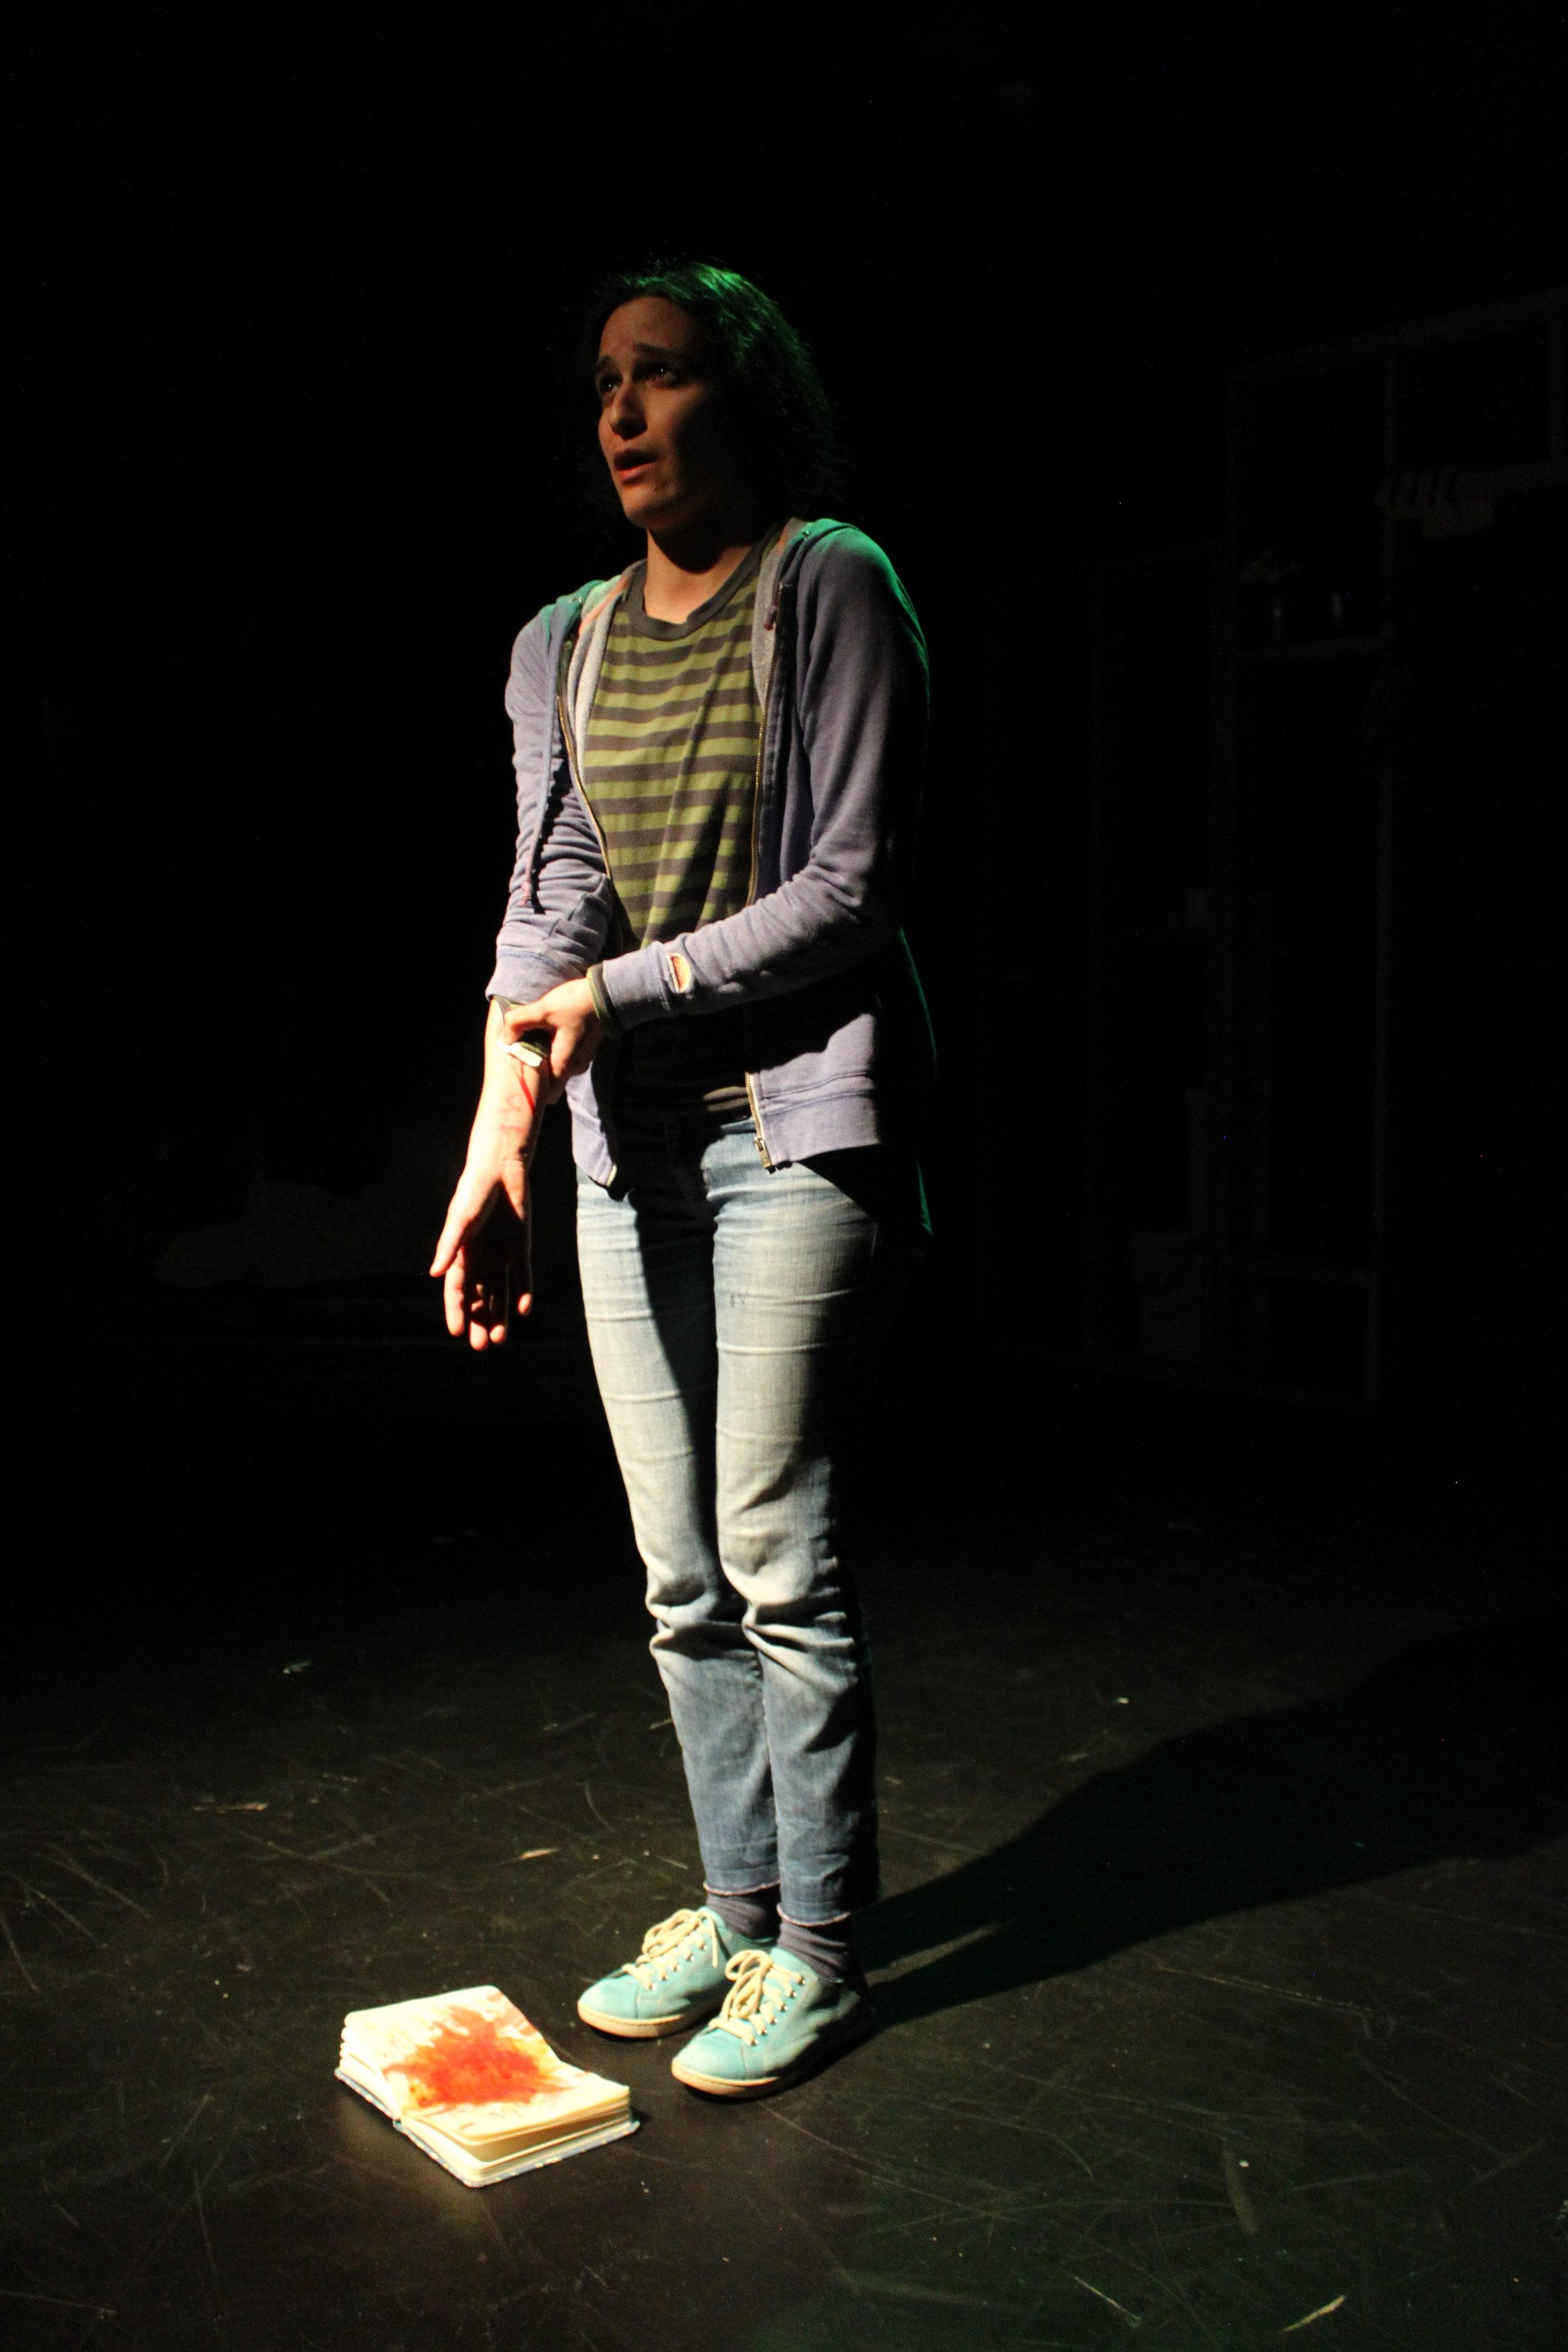 Lily Hargis